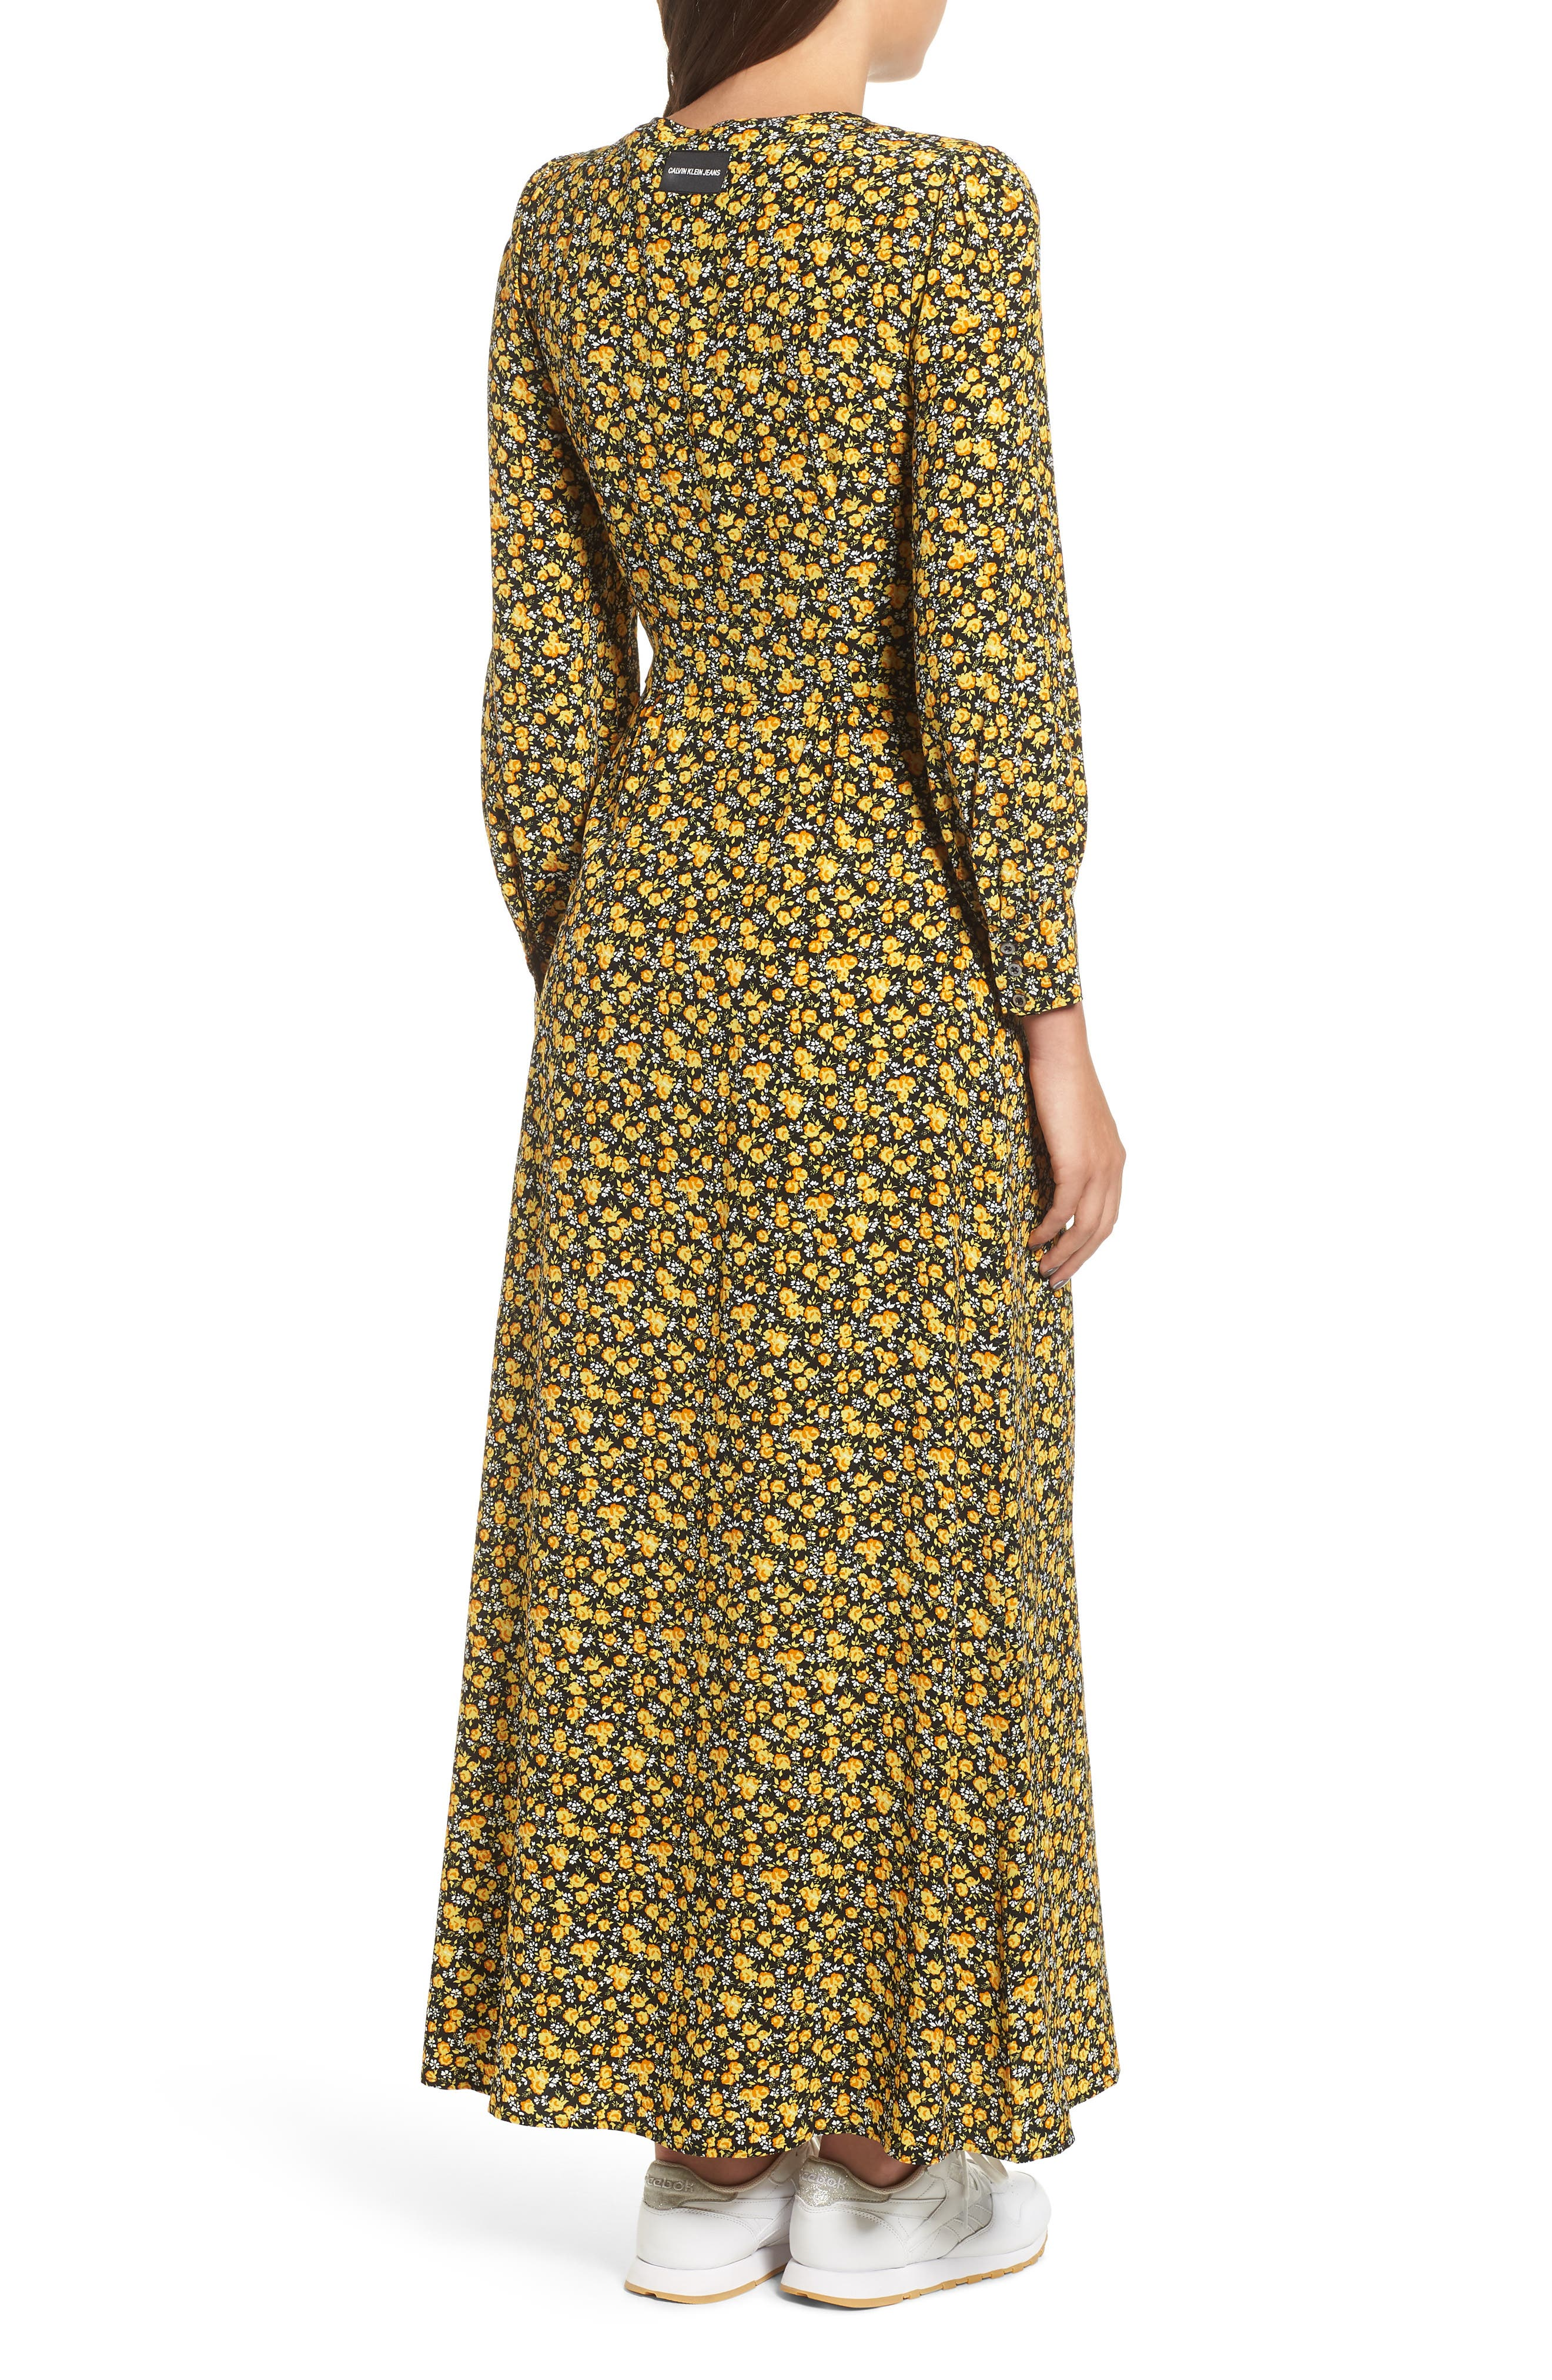 Ditzy Floral Dress,                             Alternate thumbnail 2, color,                             DITSY FLOWER